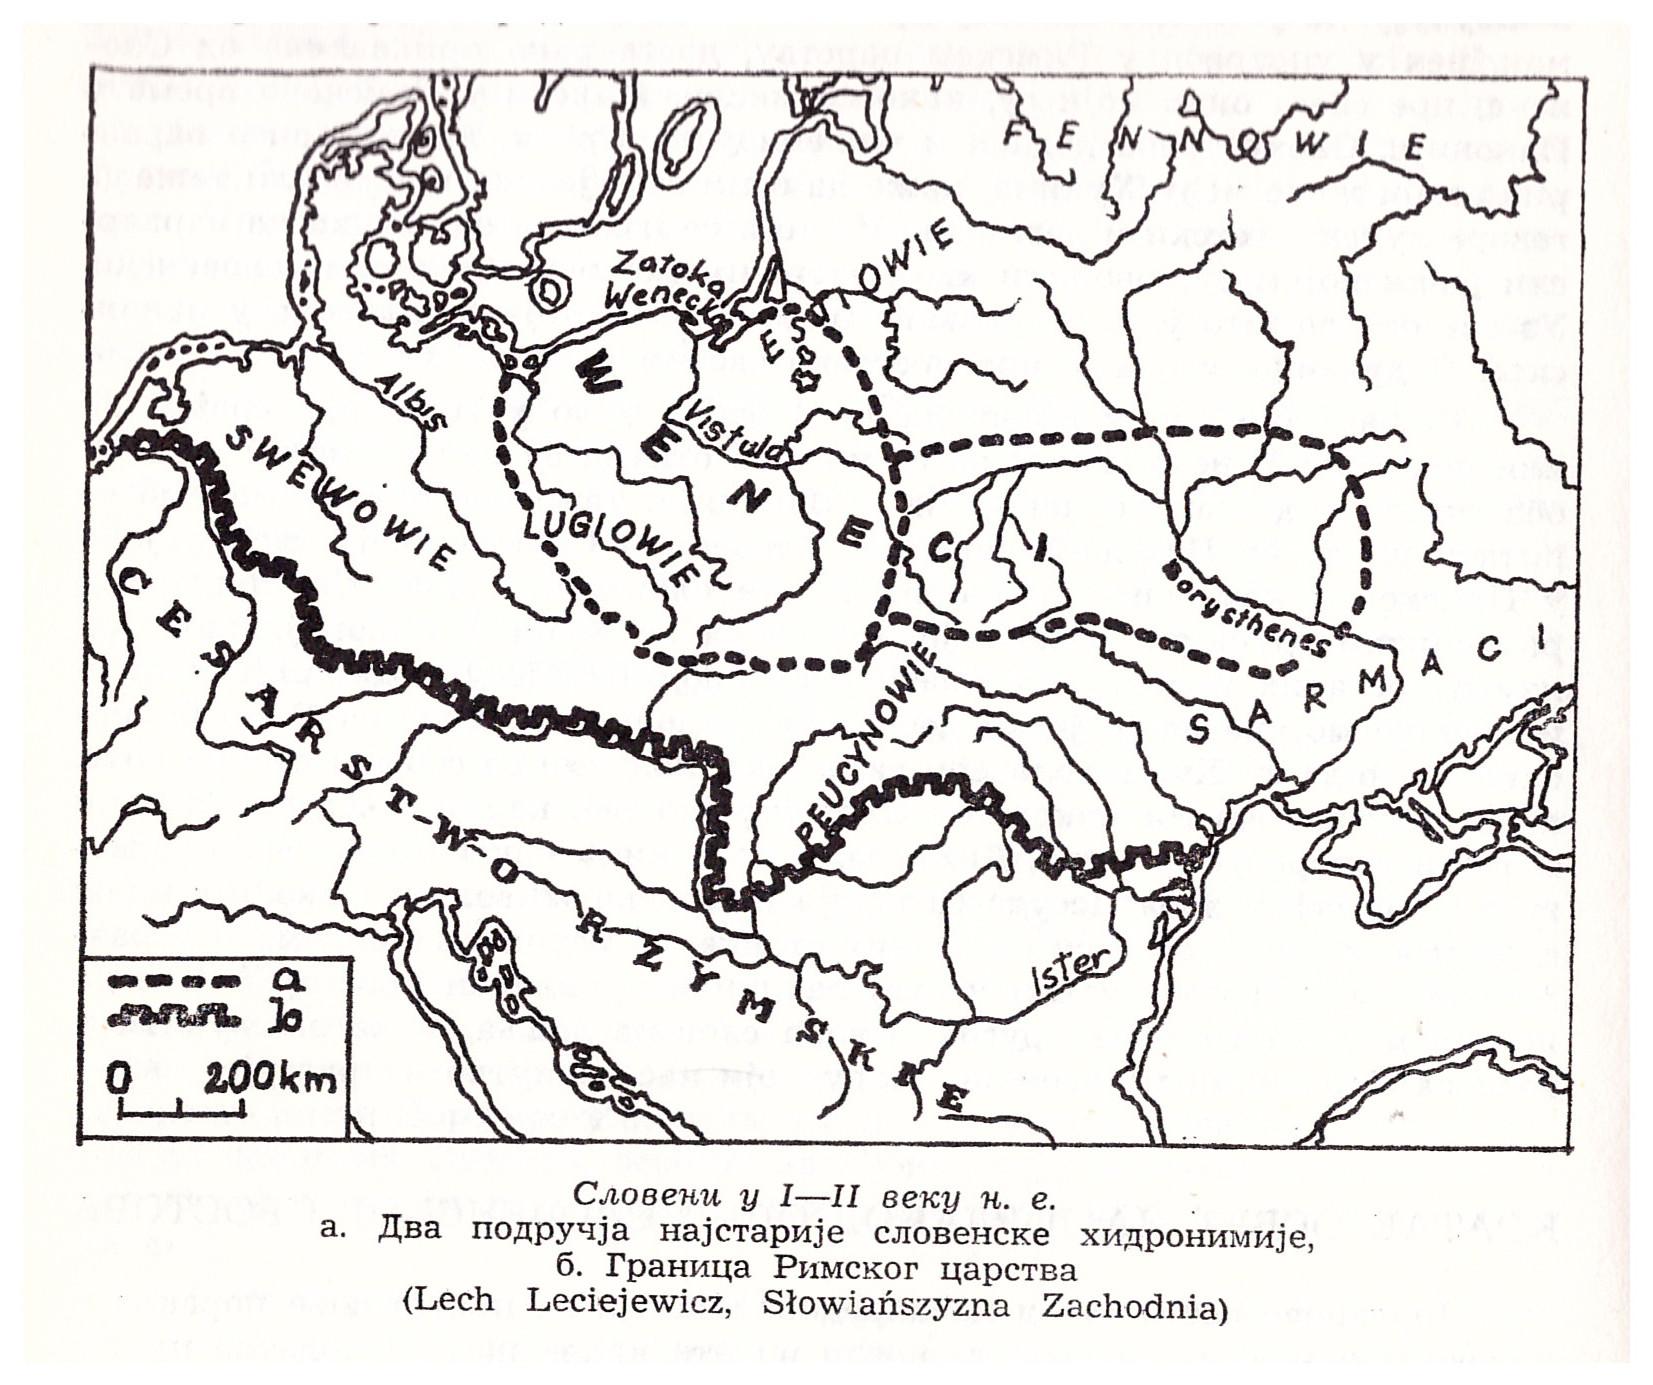 Karta rasporeda Venda, Sveva i susednih naroda u I i II veku Leha Lehjeviča